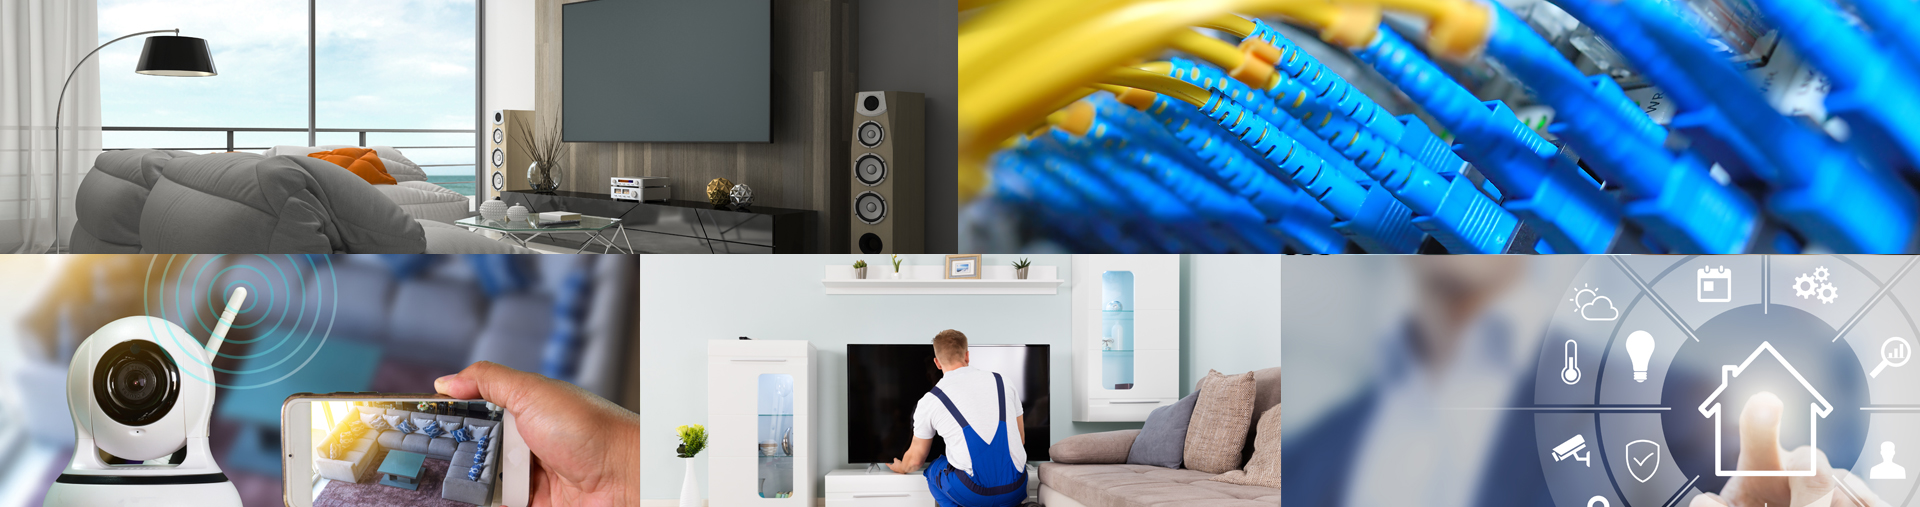 Powder-Springs-GA-home-Automation